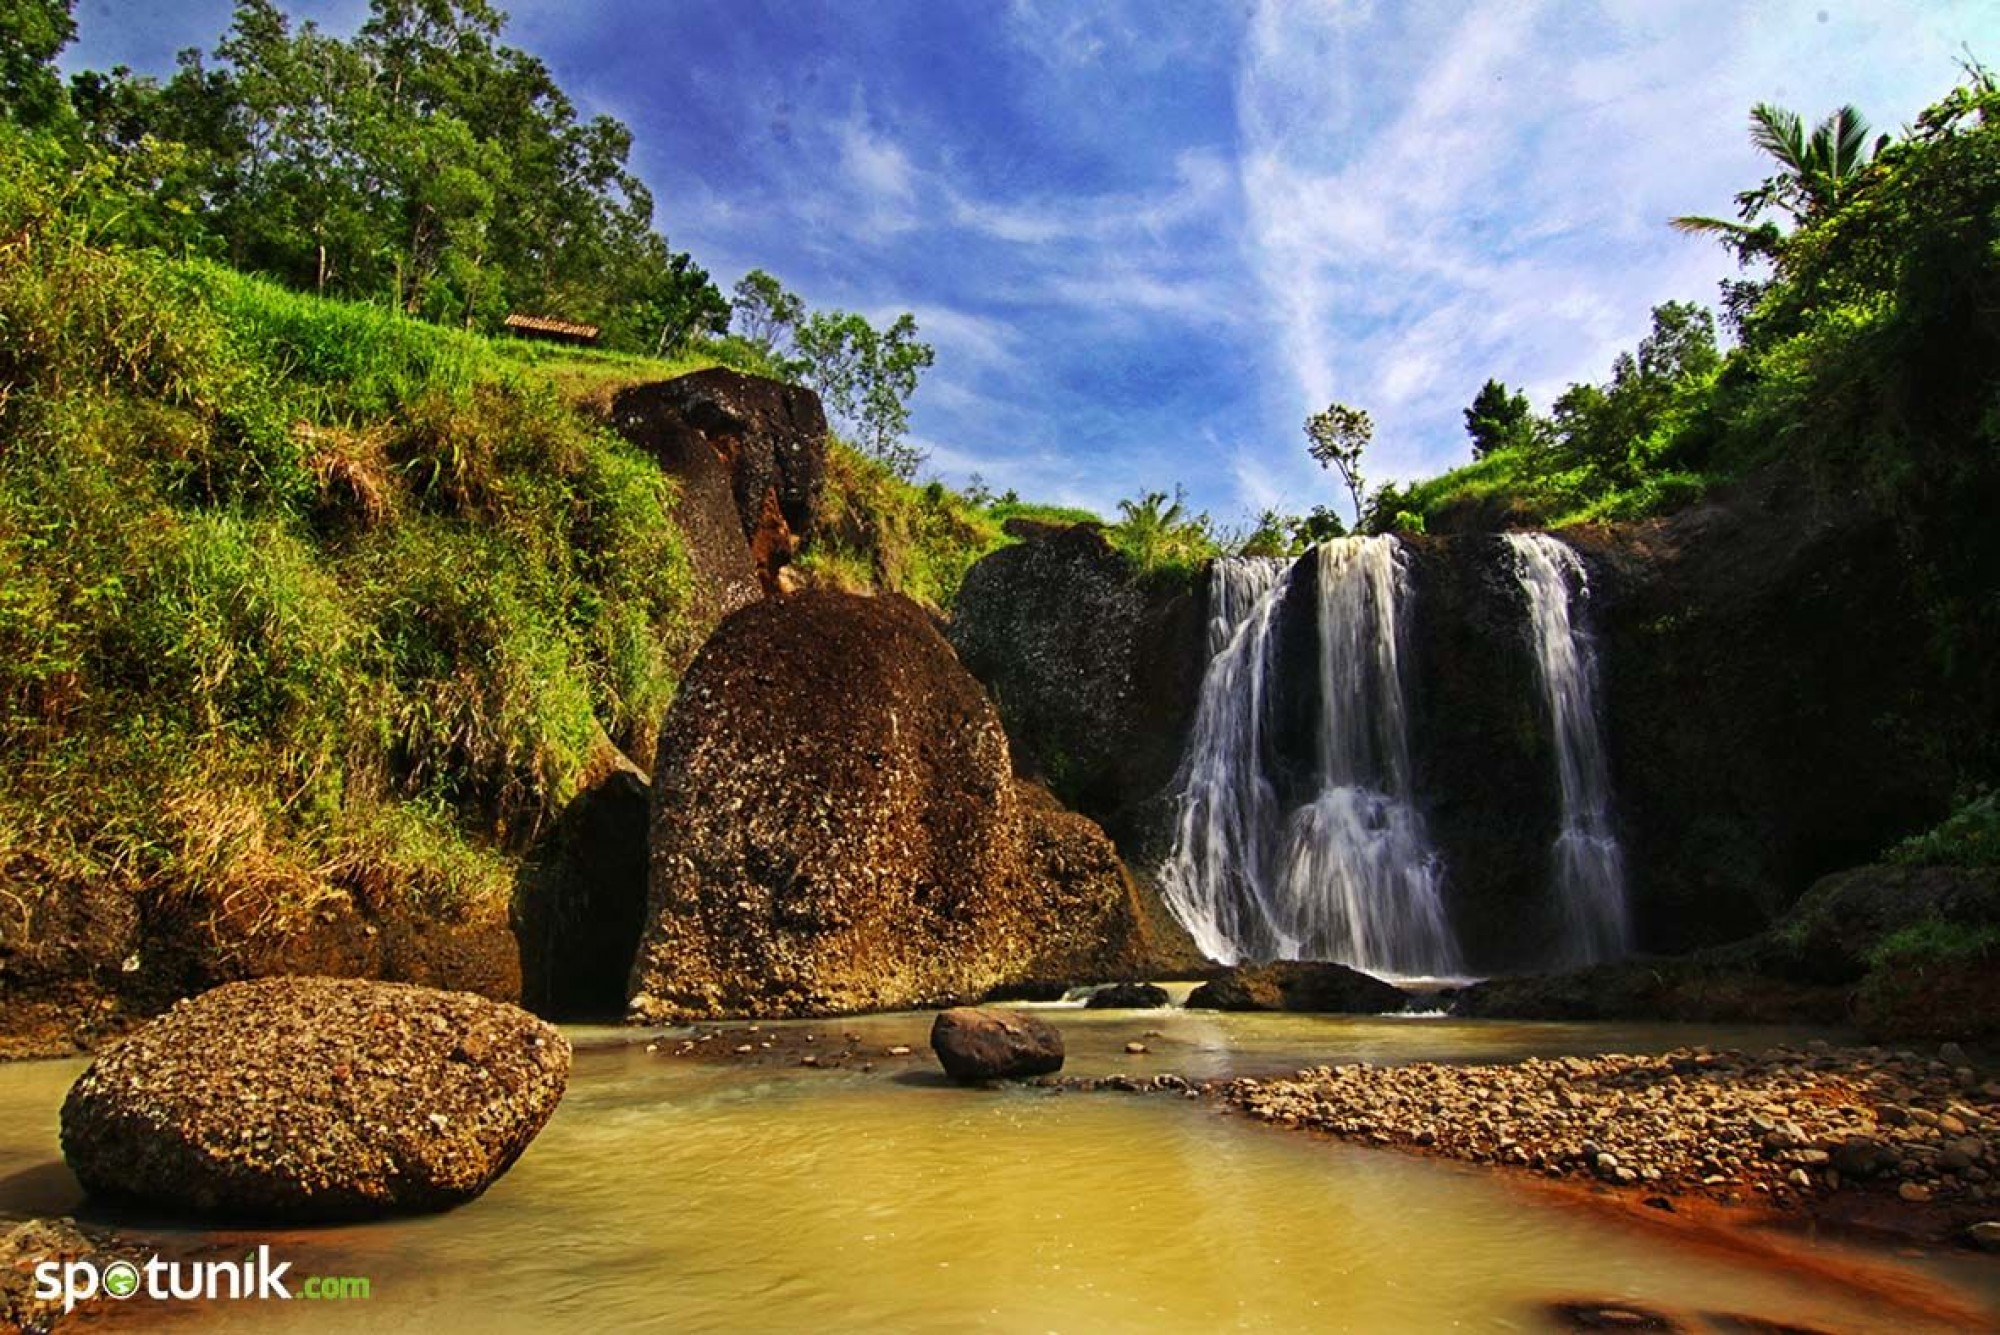 Air Terjun Kedung Kandang Pesona Patuk Kab Gunungkidul